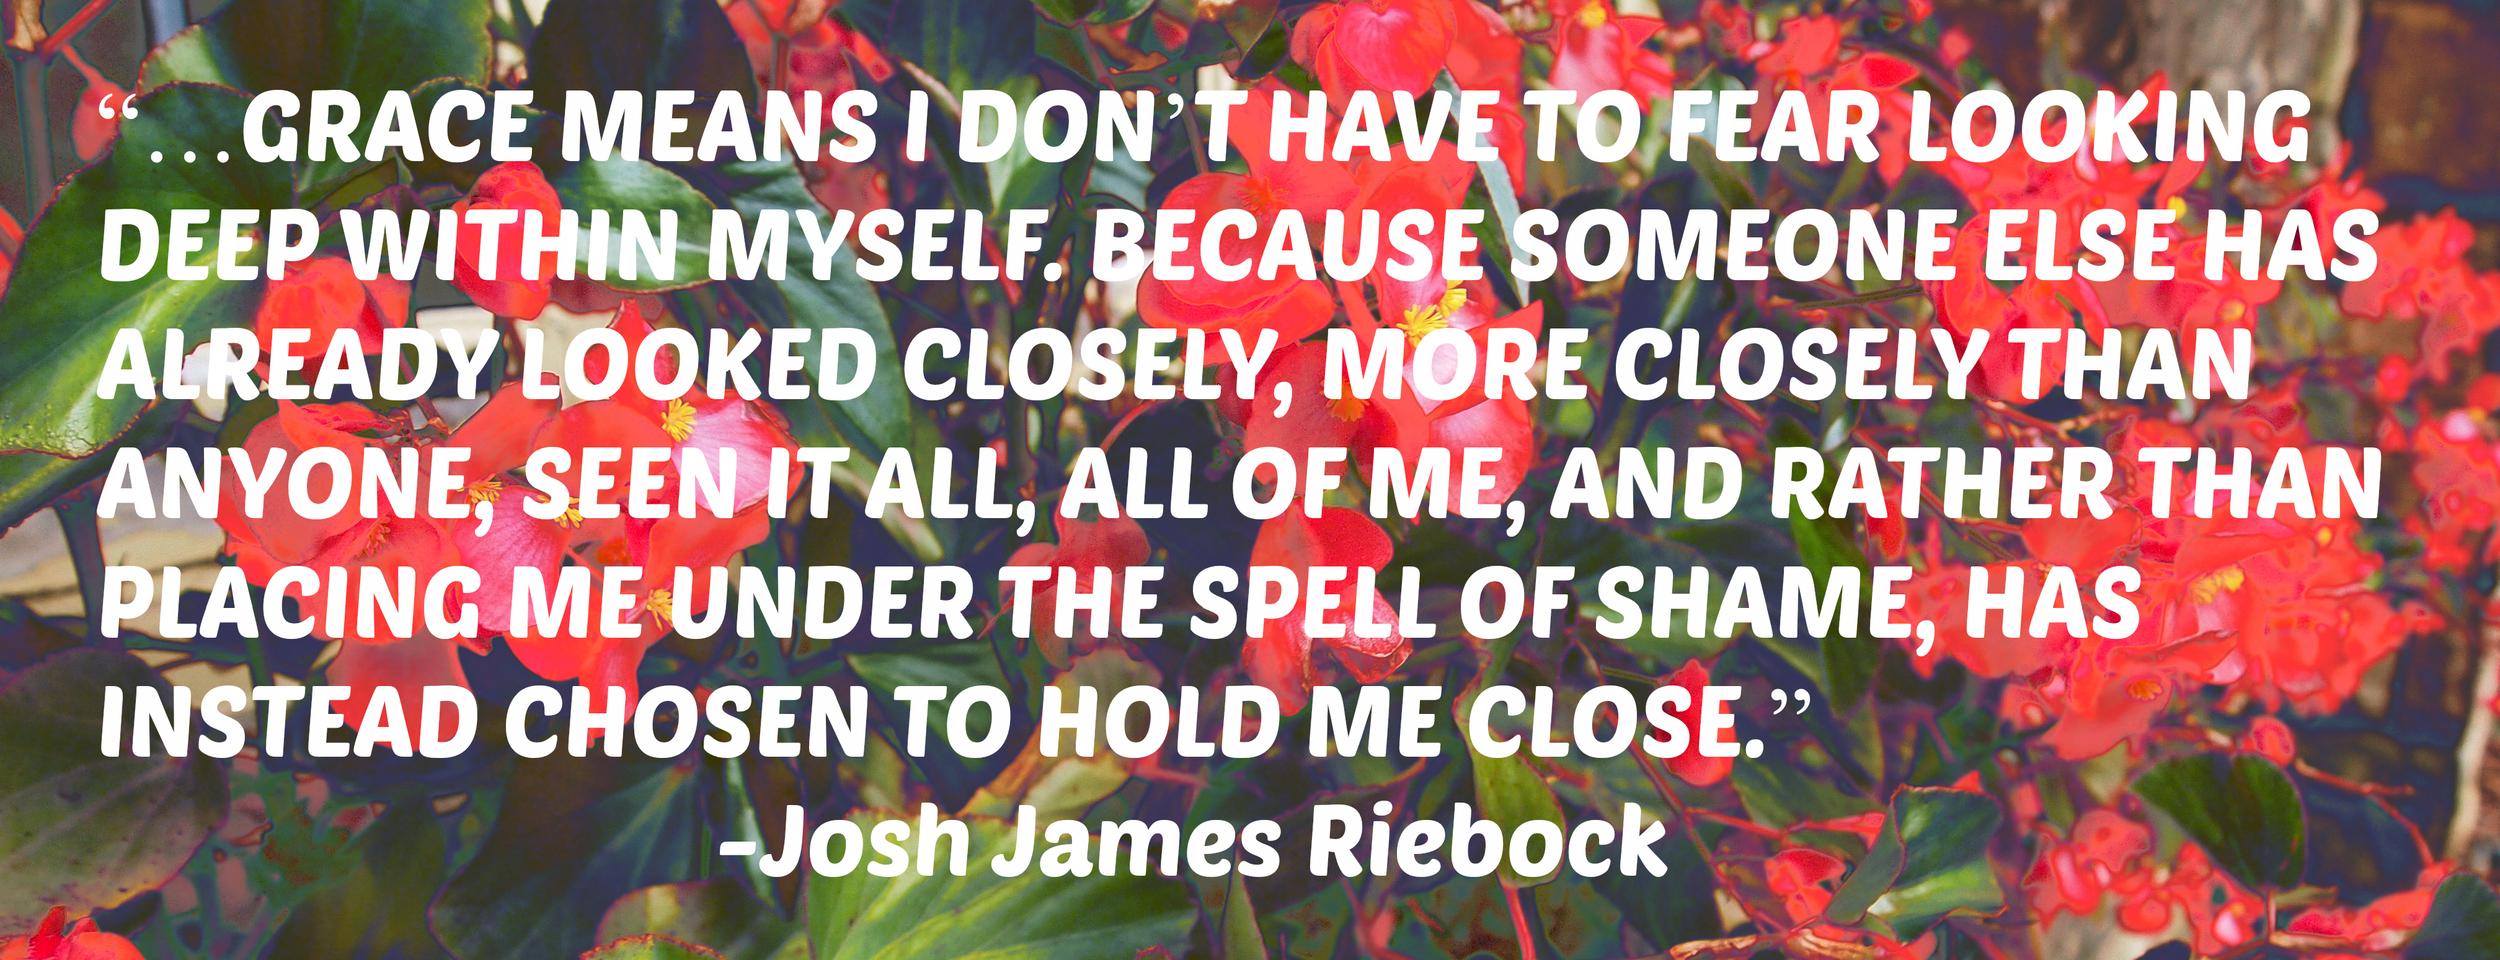 grace means josh james riebock.jpg